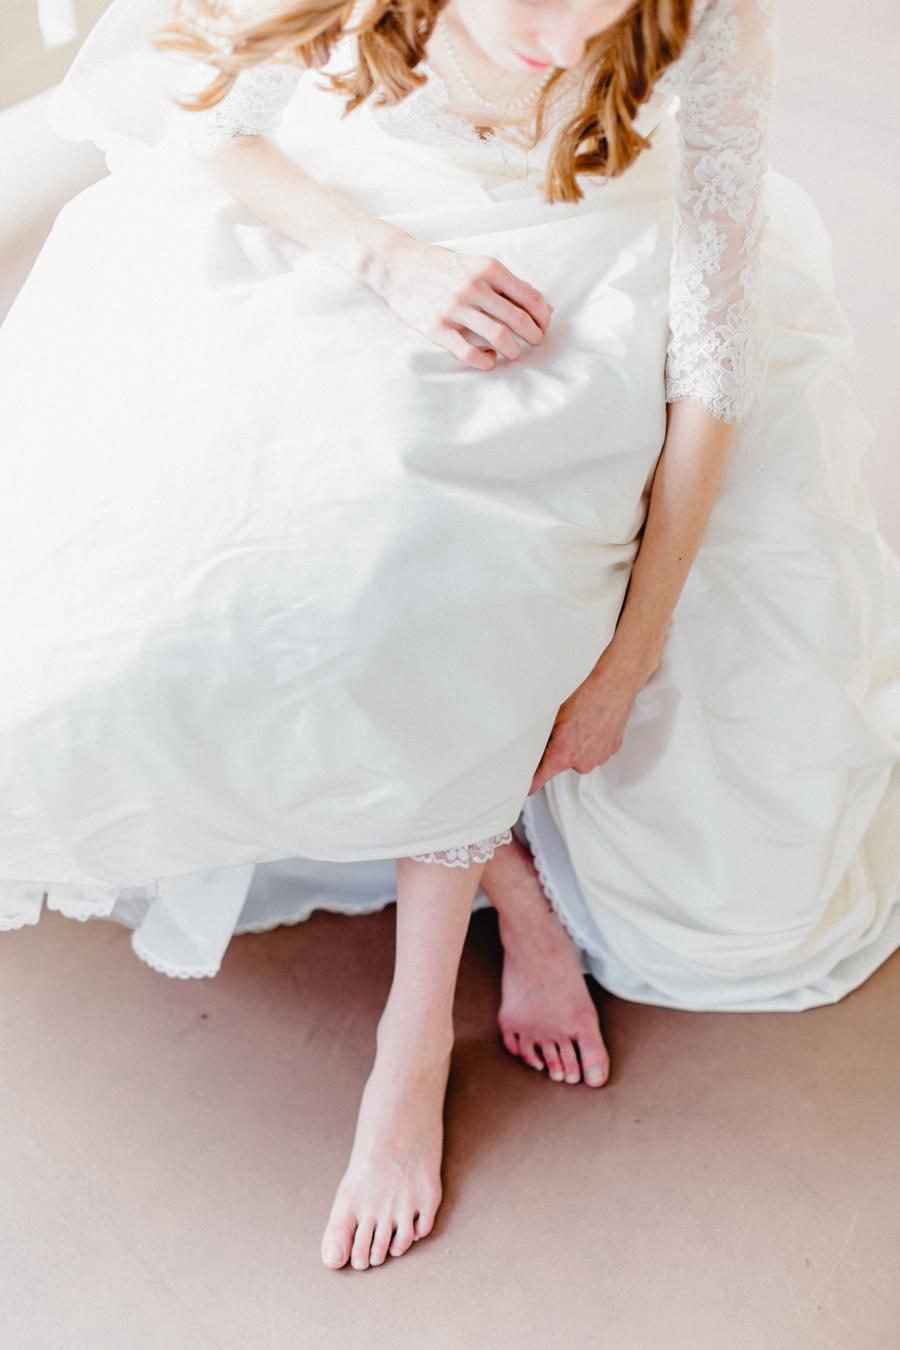 Bride With Bare Feet Elizabeth Anne Designs The Wedding